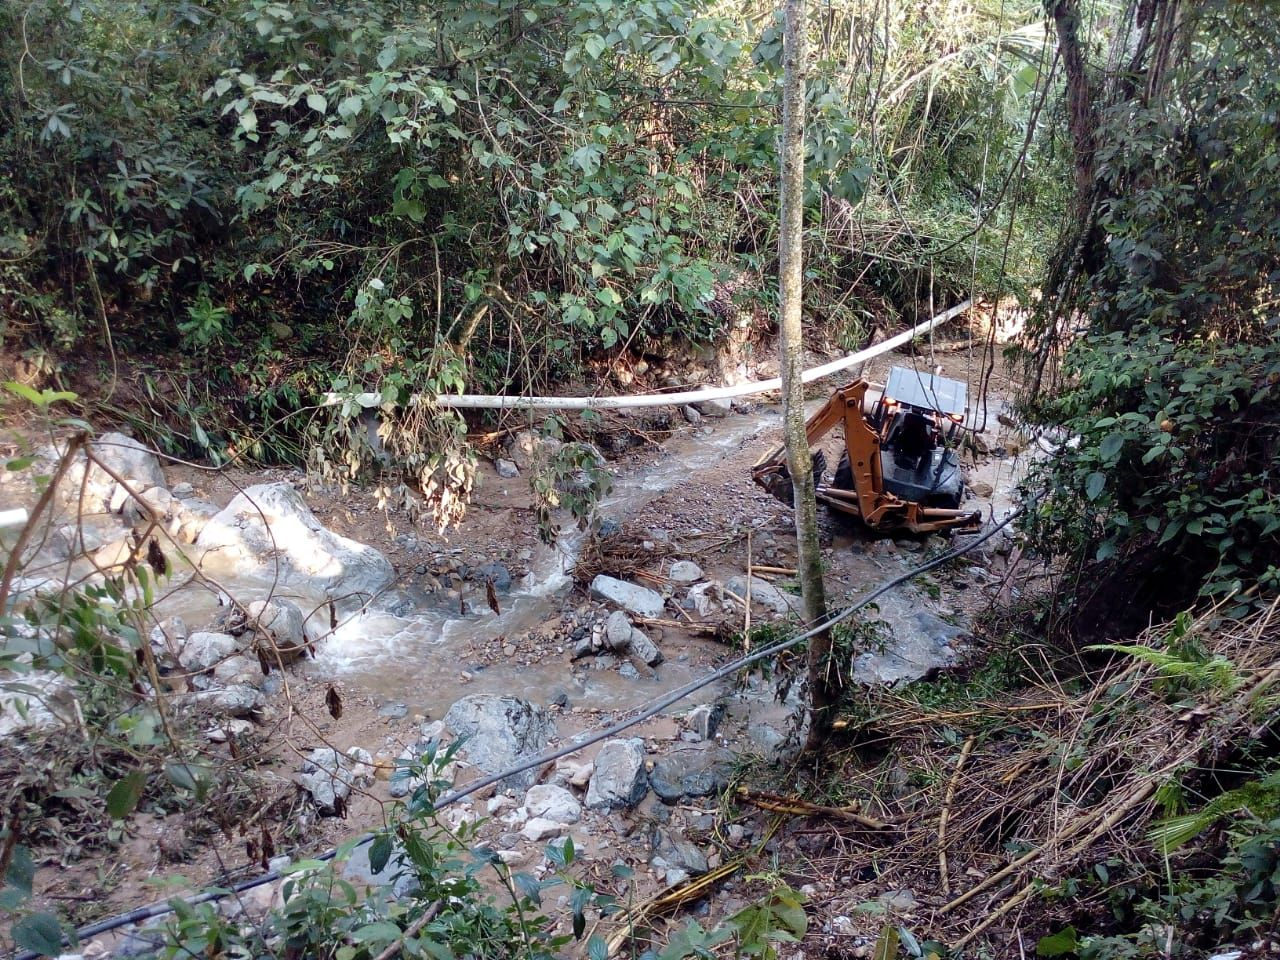 Carrotaque suministrará agua a usuarios afectados por colapso de acueducto en el sur